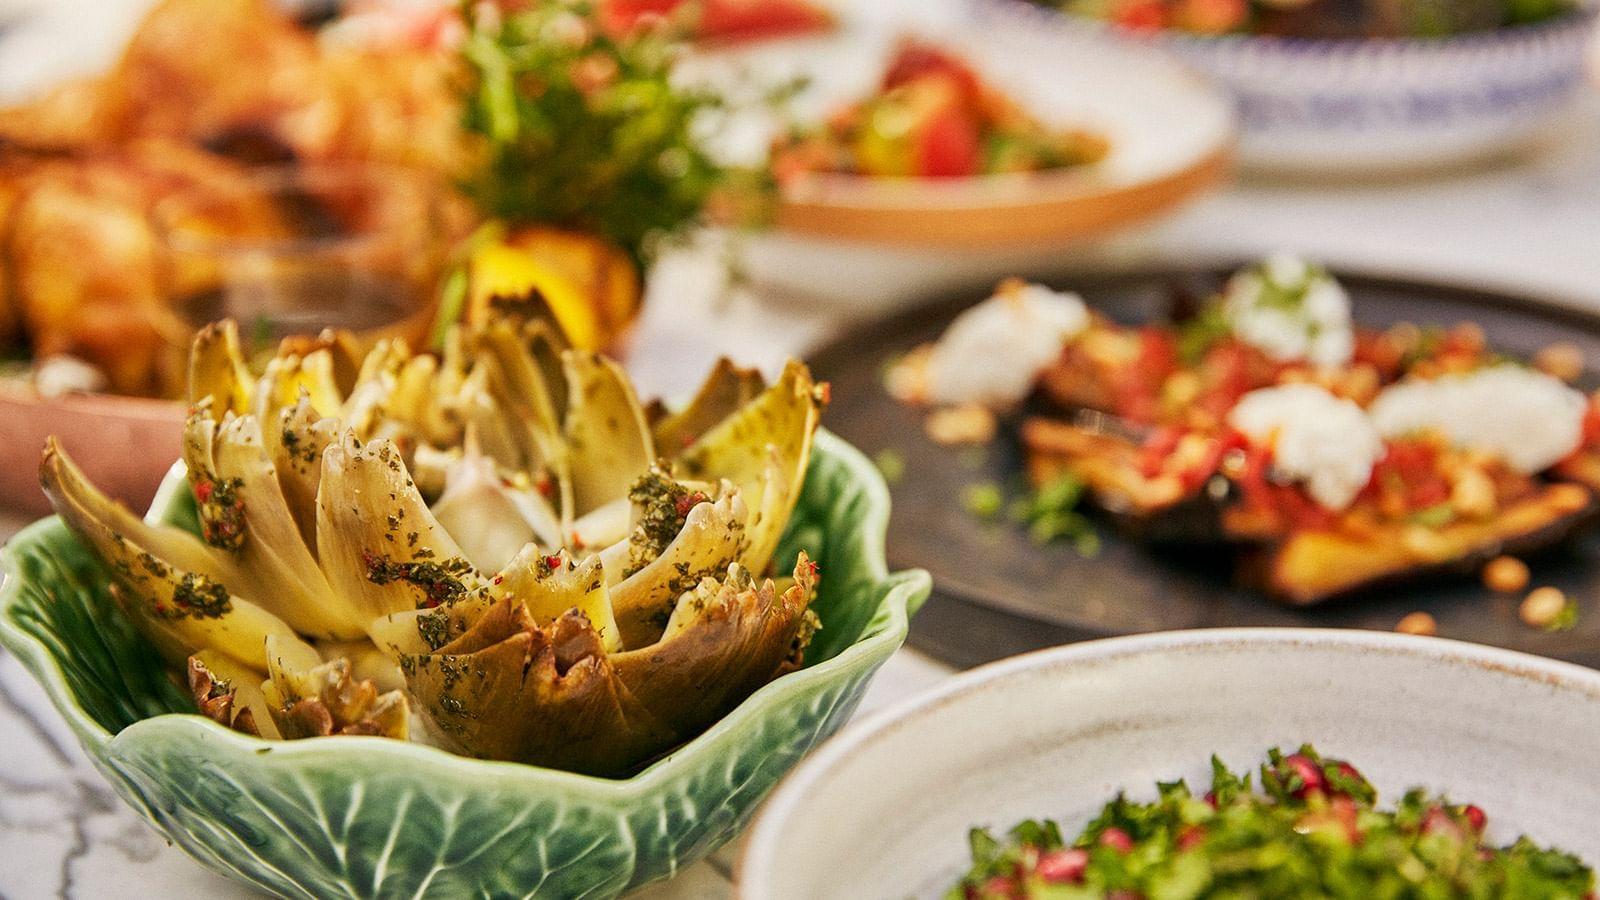 Food at El Patio Restaurant at Marbella Club Hotel